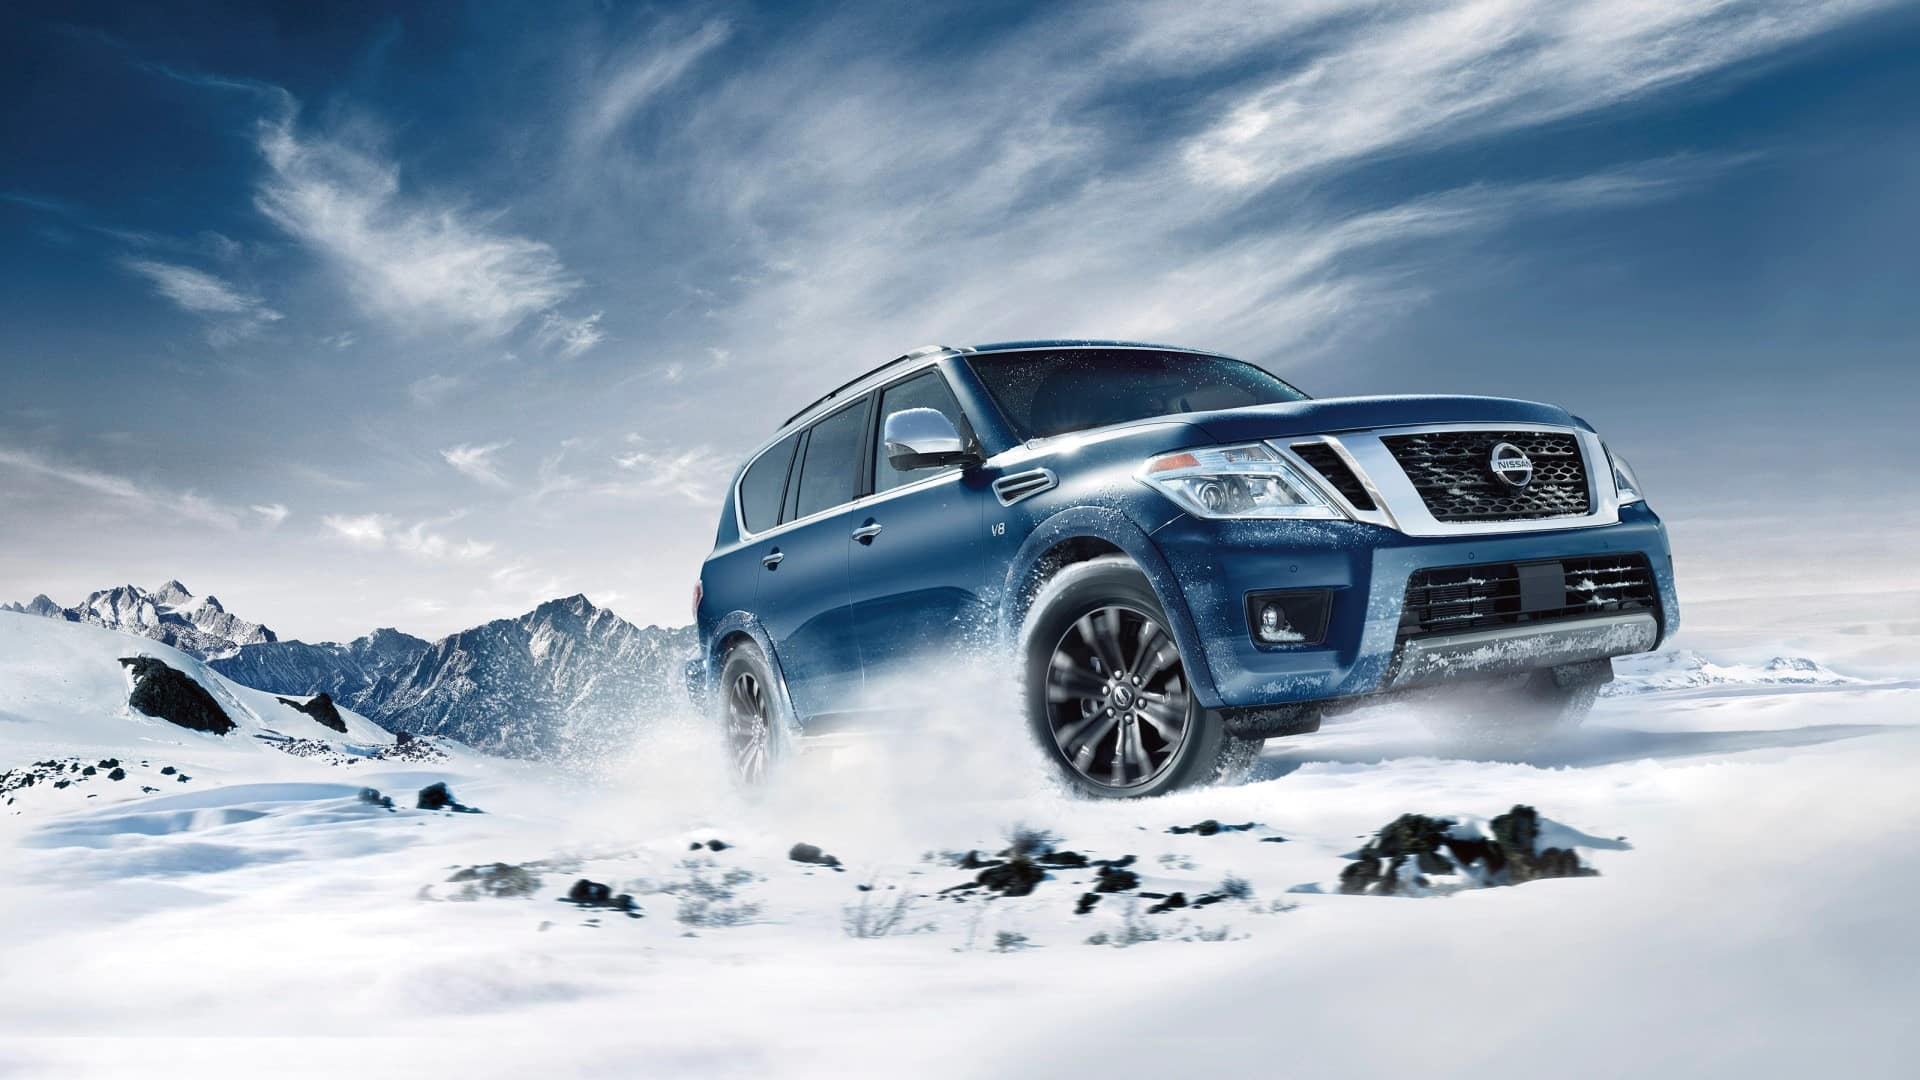 Armada_Snow_Driving